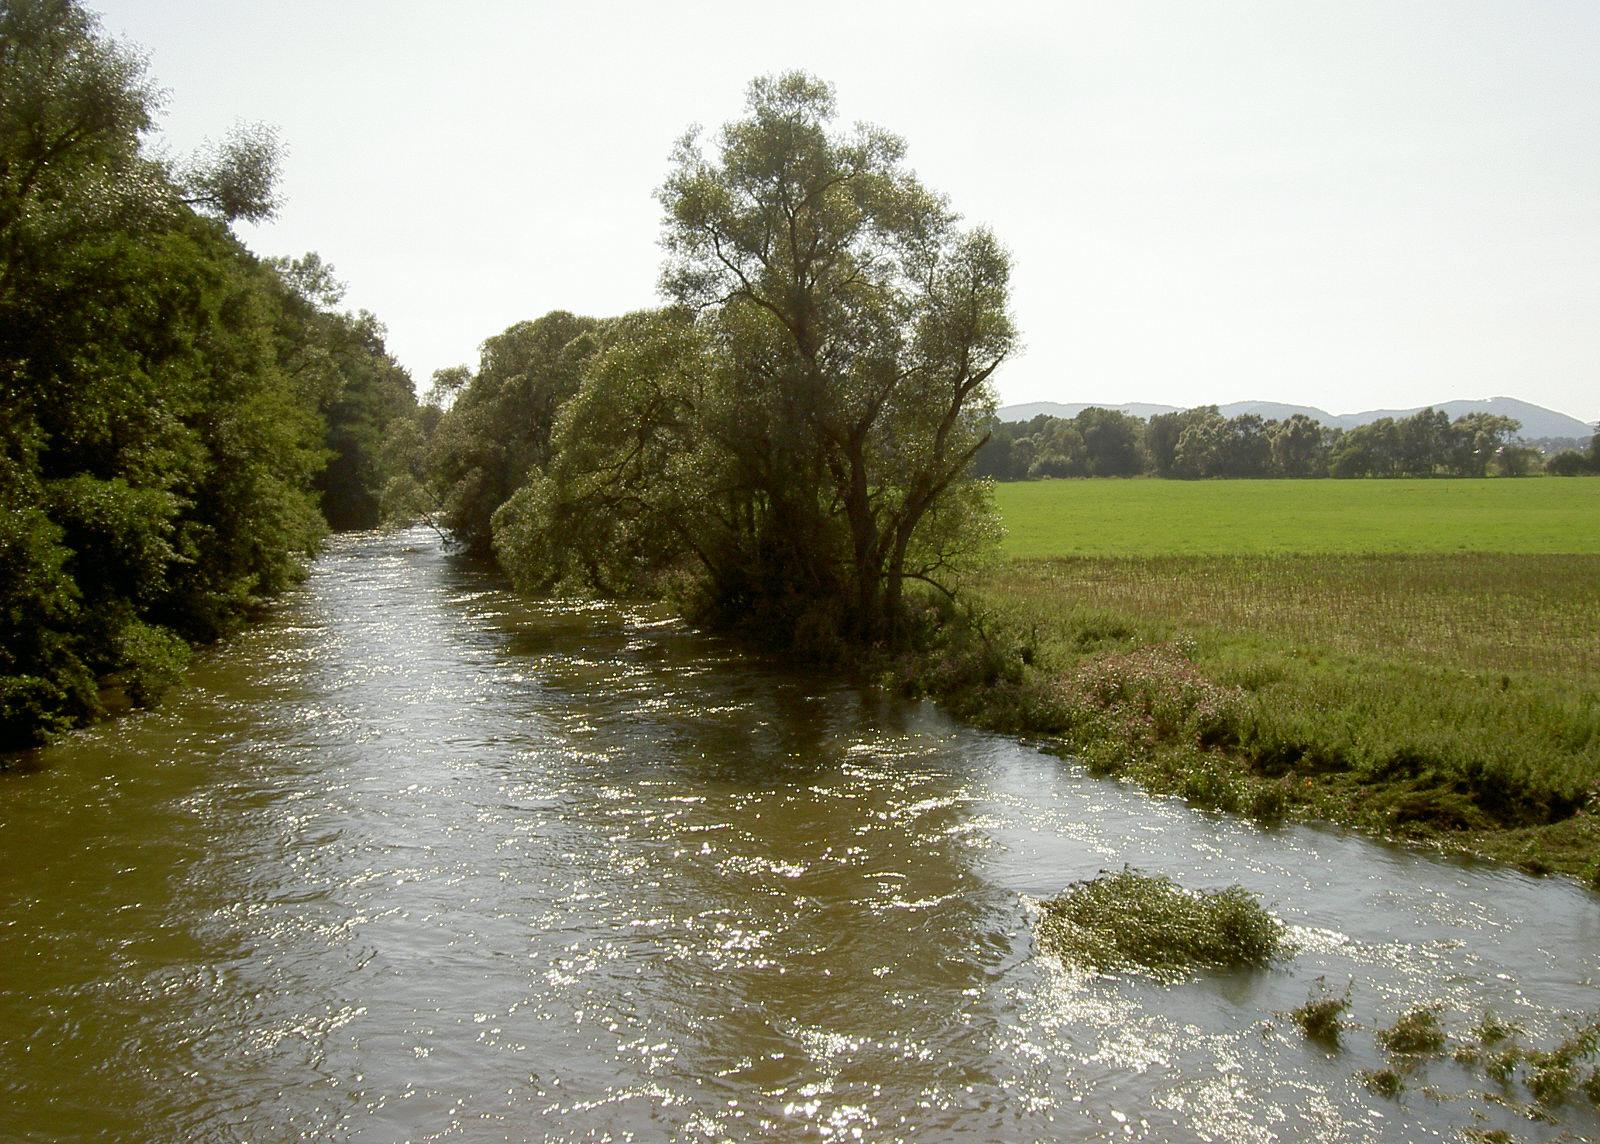 """River Eder near Ederauenradweg FKB2"" by Simone - Own work. Licensed under CC BY 2.5 via Wikimedia Commons - https://commons.wikimedia.org/wiki/File:River_Eder_near_Ederauenradweg_FKB2.jpg#mediaviewer/File:River_Eder_near_Ederauenradweg_FKB2.jpg"